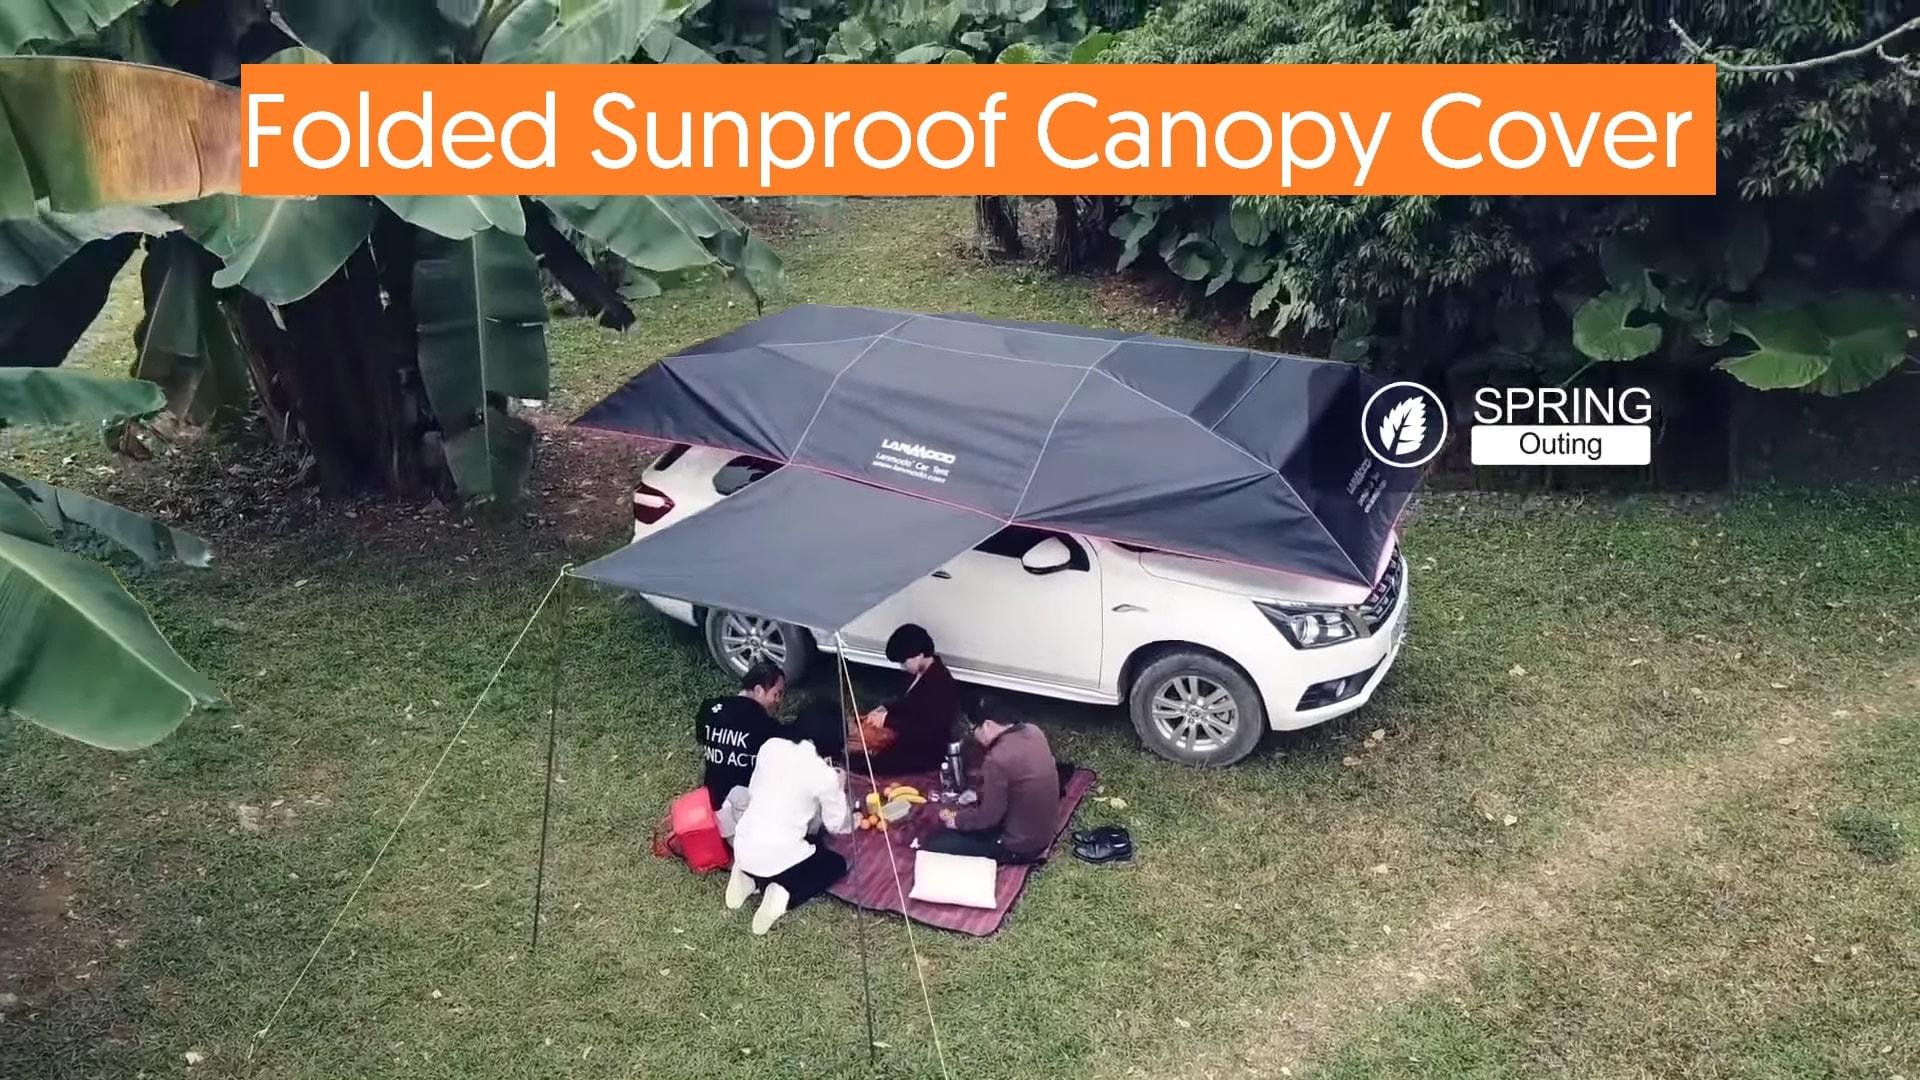 TecMac Folded Sunproof Canopy Cover